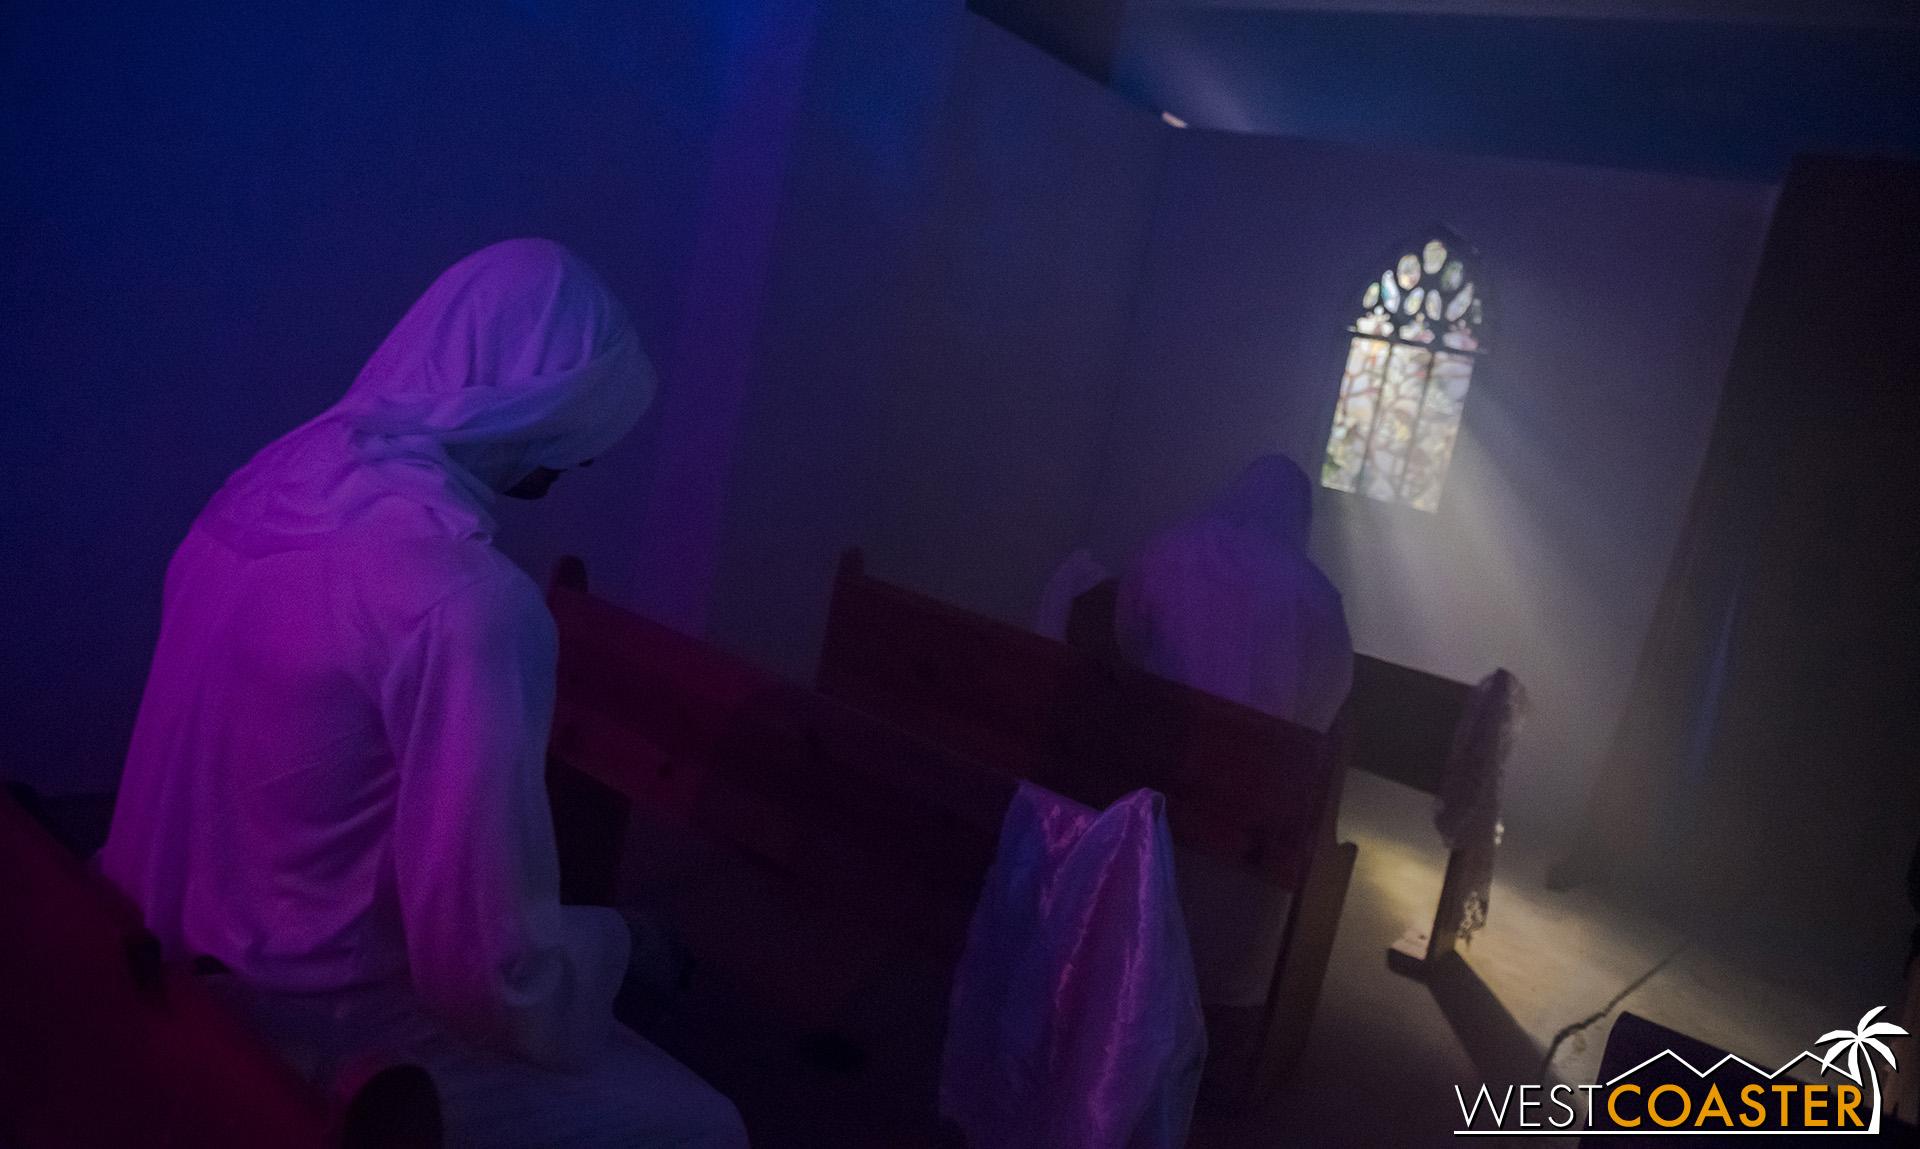 Rolling into a spooky church scene.